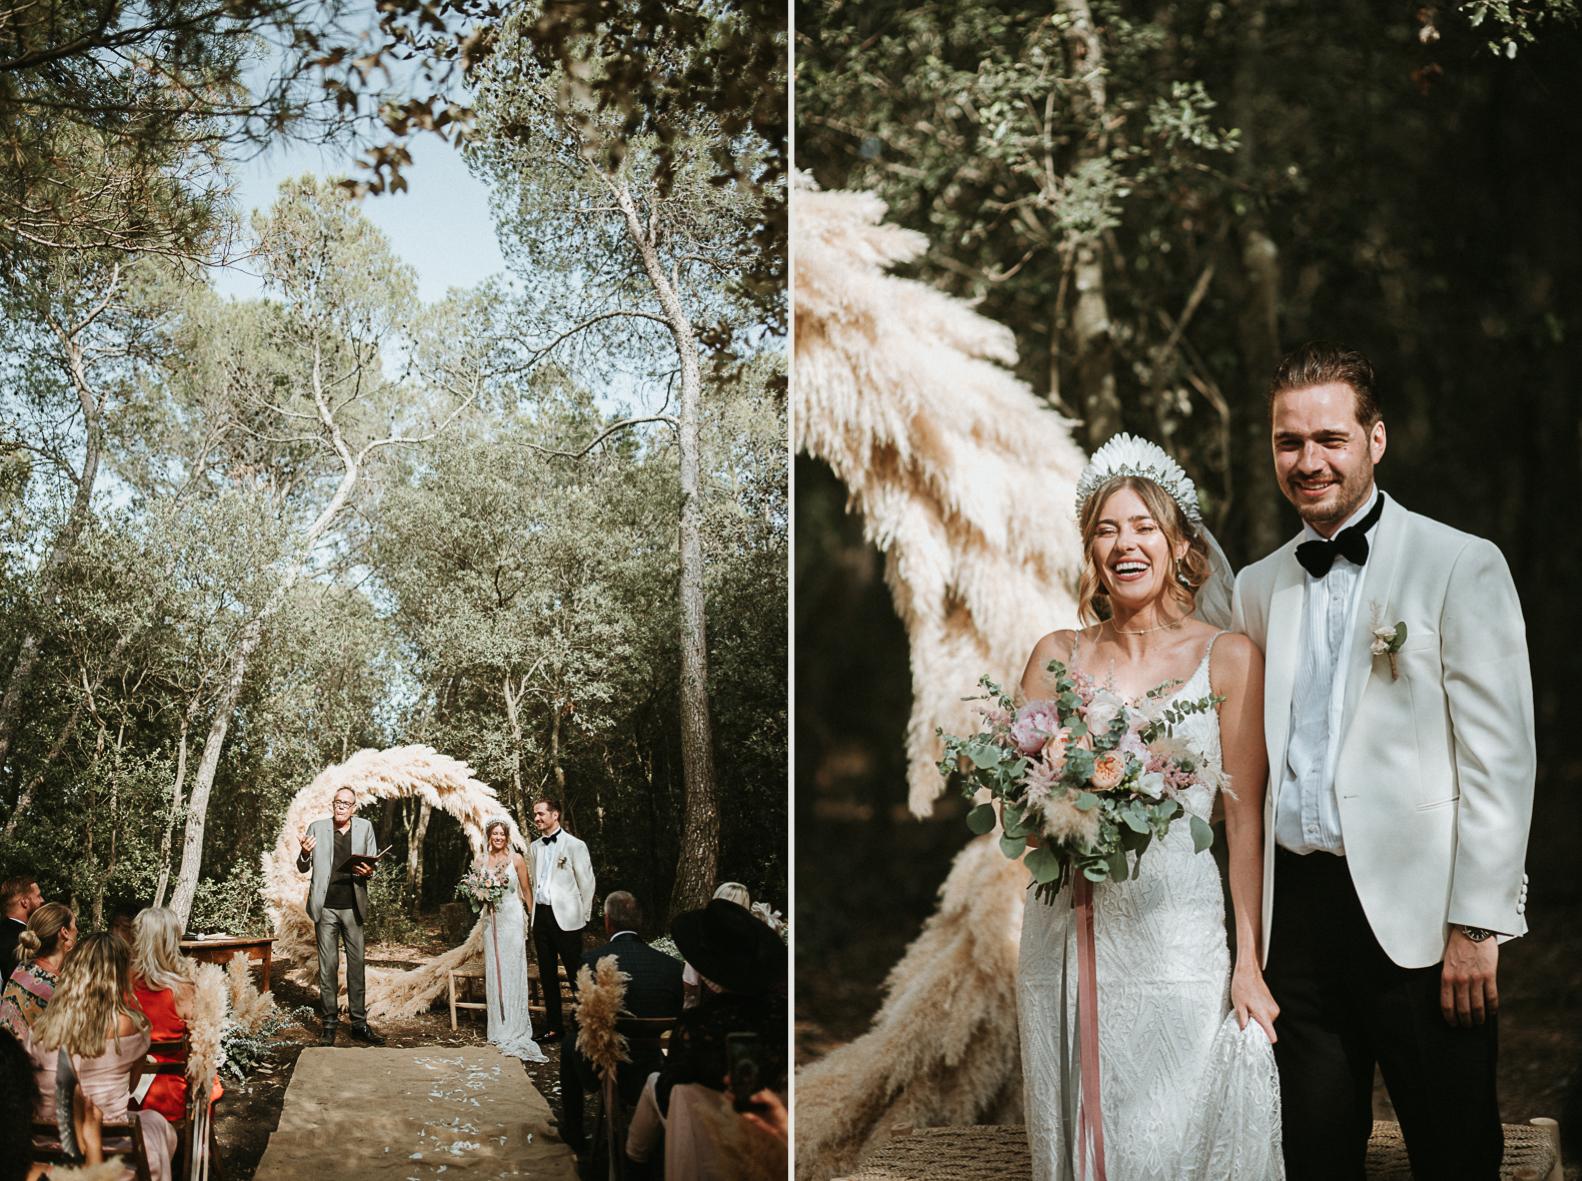 miks-sels-mas-terrats-girona-wedding-photographer-42.1